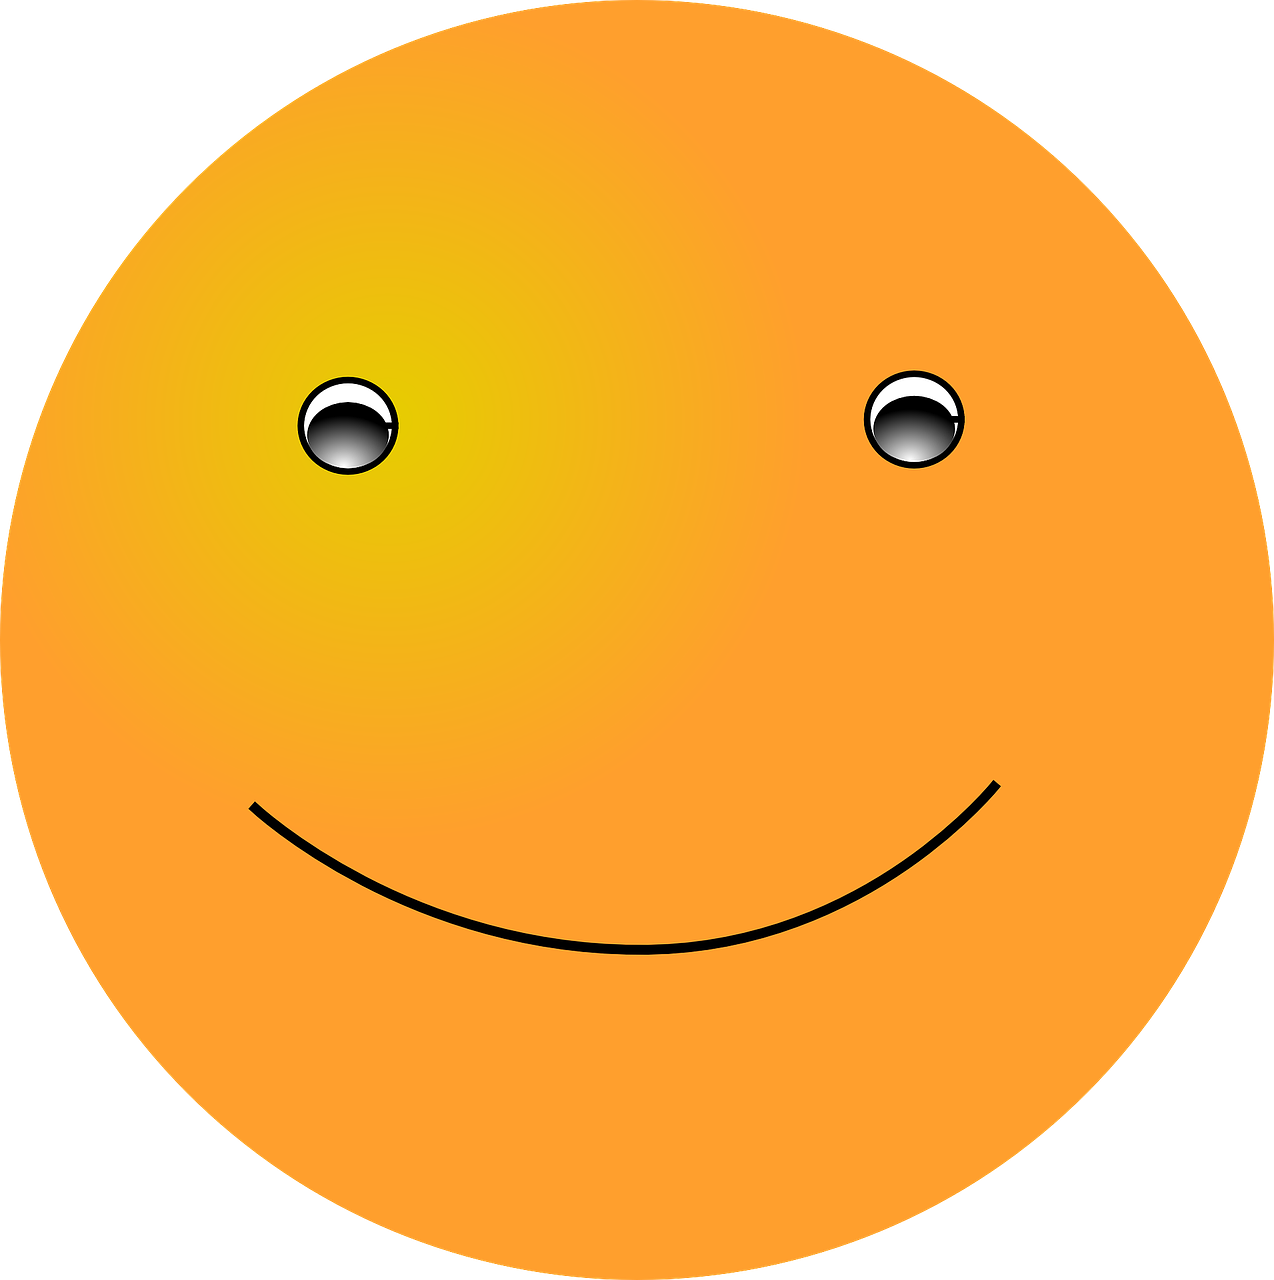 Gratis Obraz Na Pixabay Buzka Emotikon Wyrazenie Public Domain Clip Art Smiley Art Images